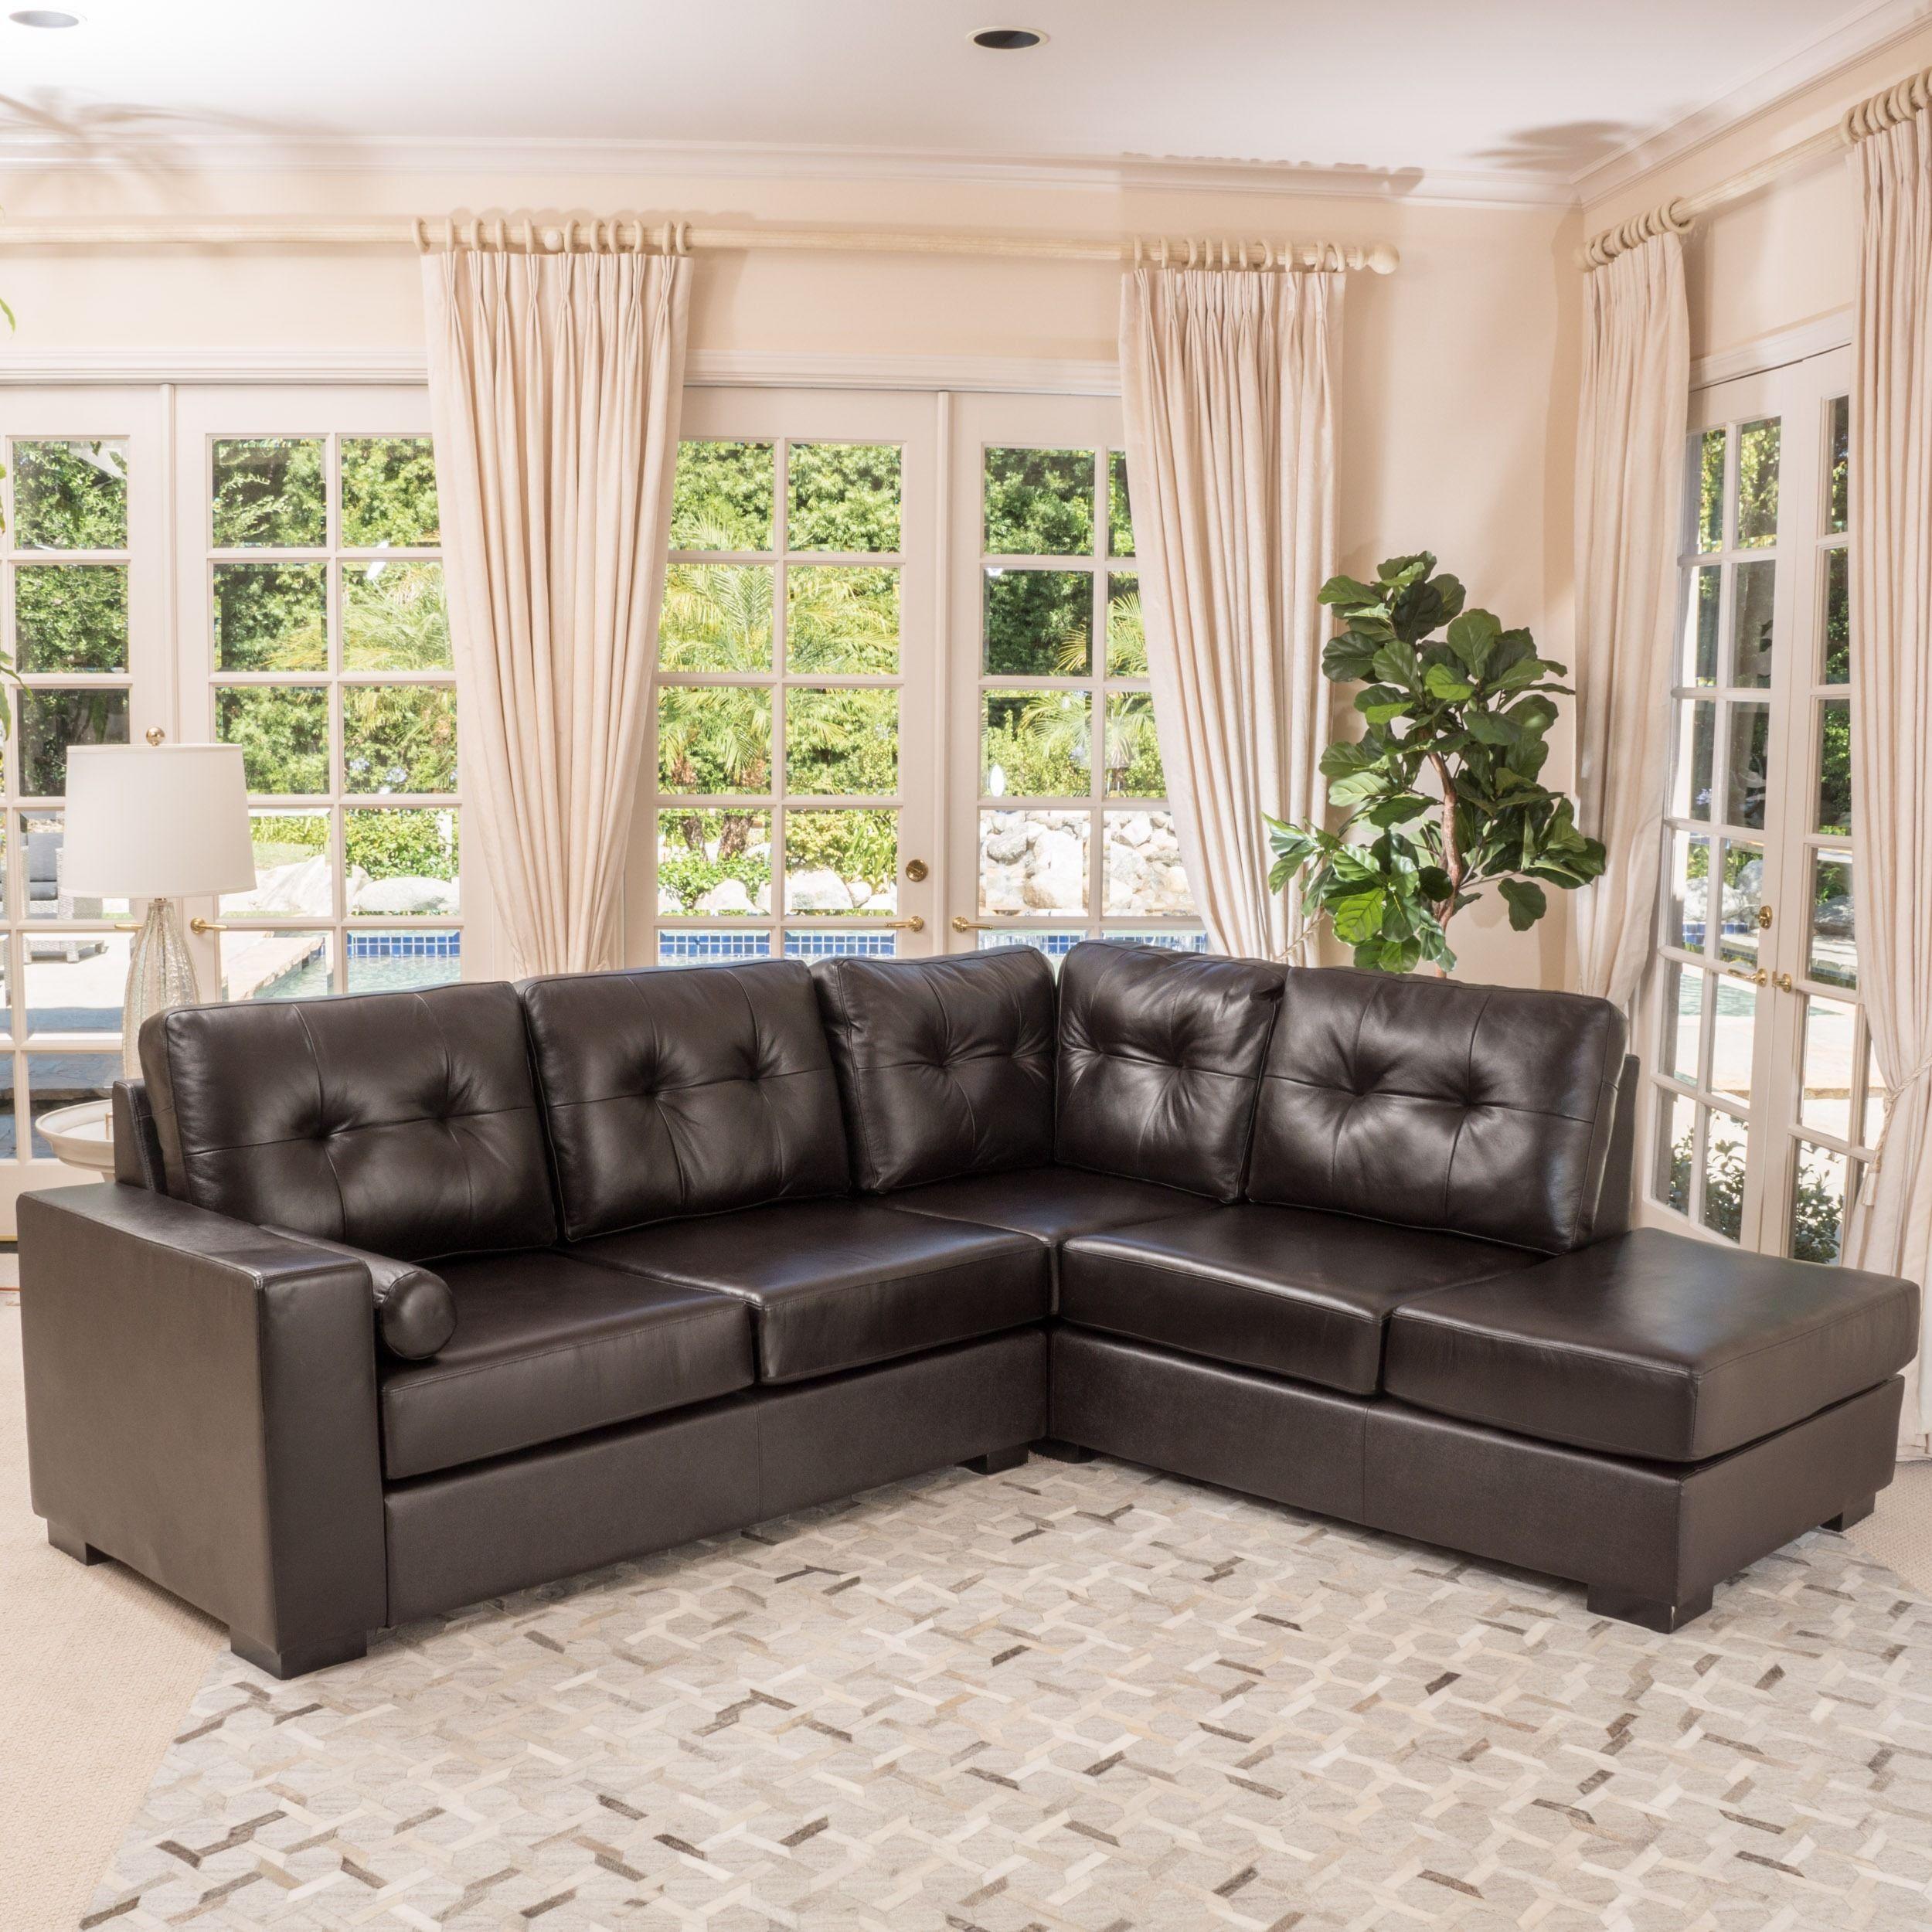 Phenomenal Elisa 2 Piece Brown Leather Sectional Sofa Set By Uwap Interior Chair Design Uwaporg